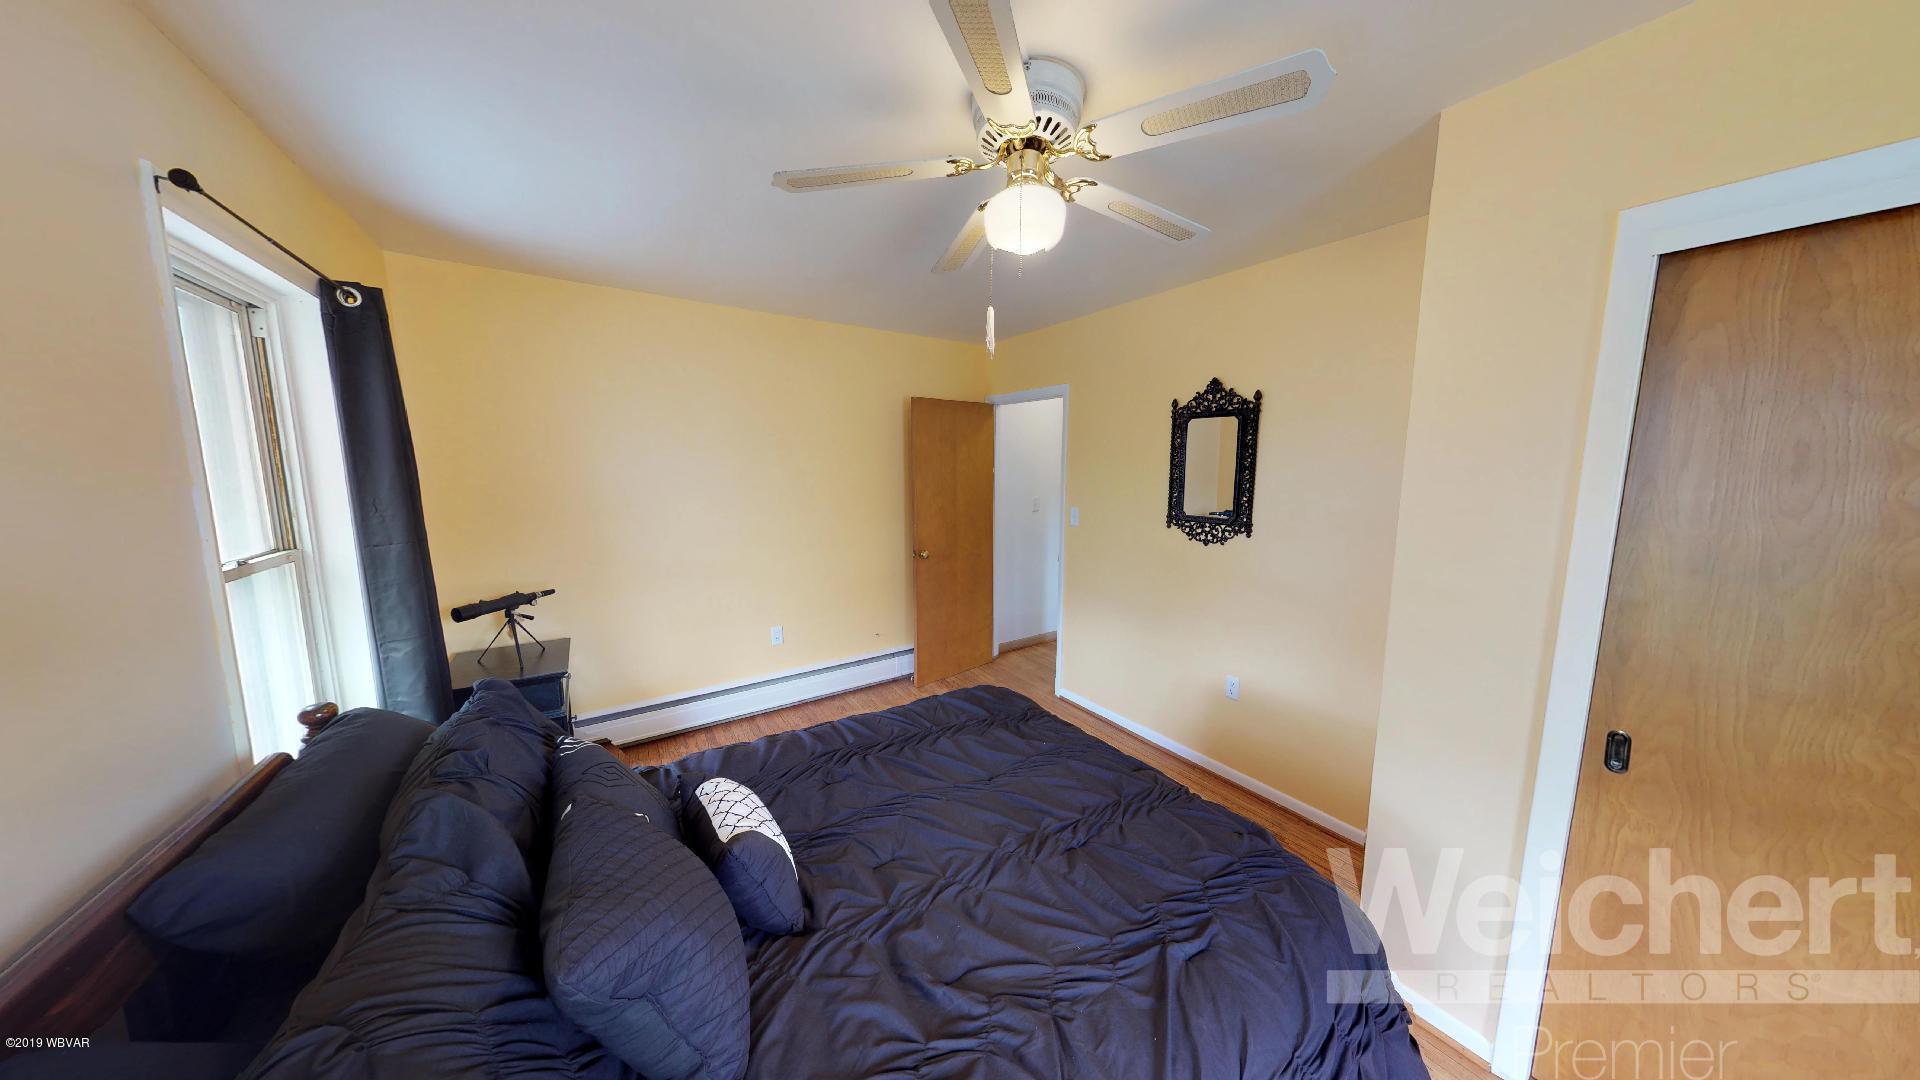 1004 ELIZABETH STREET,Williamsport,PA 17701,3 Bedrooms Bedrooms,1.5 BathroomsBathrooms,Residential,ELIZABETH,WB-87326